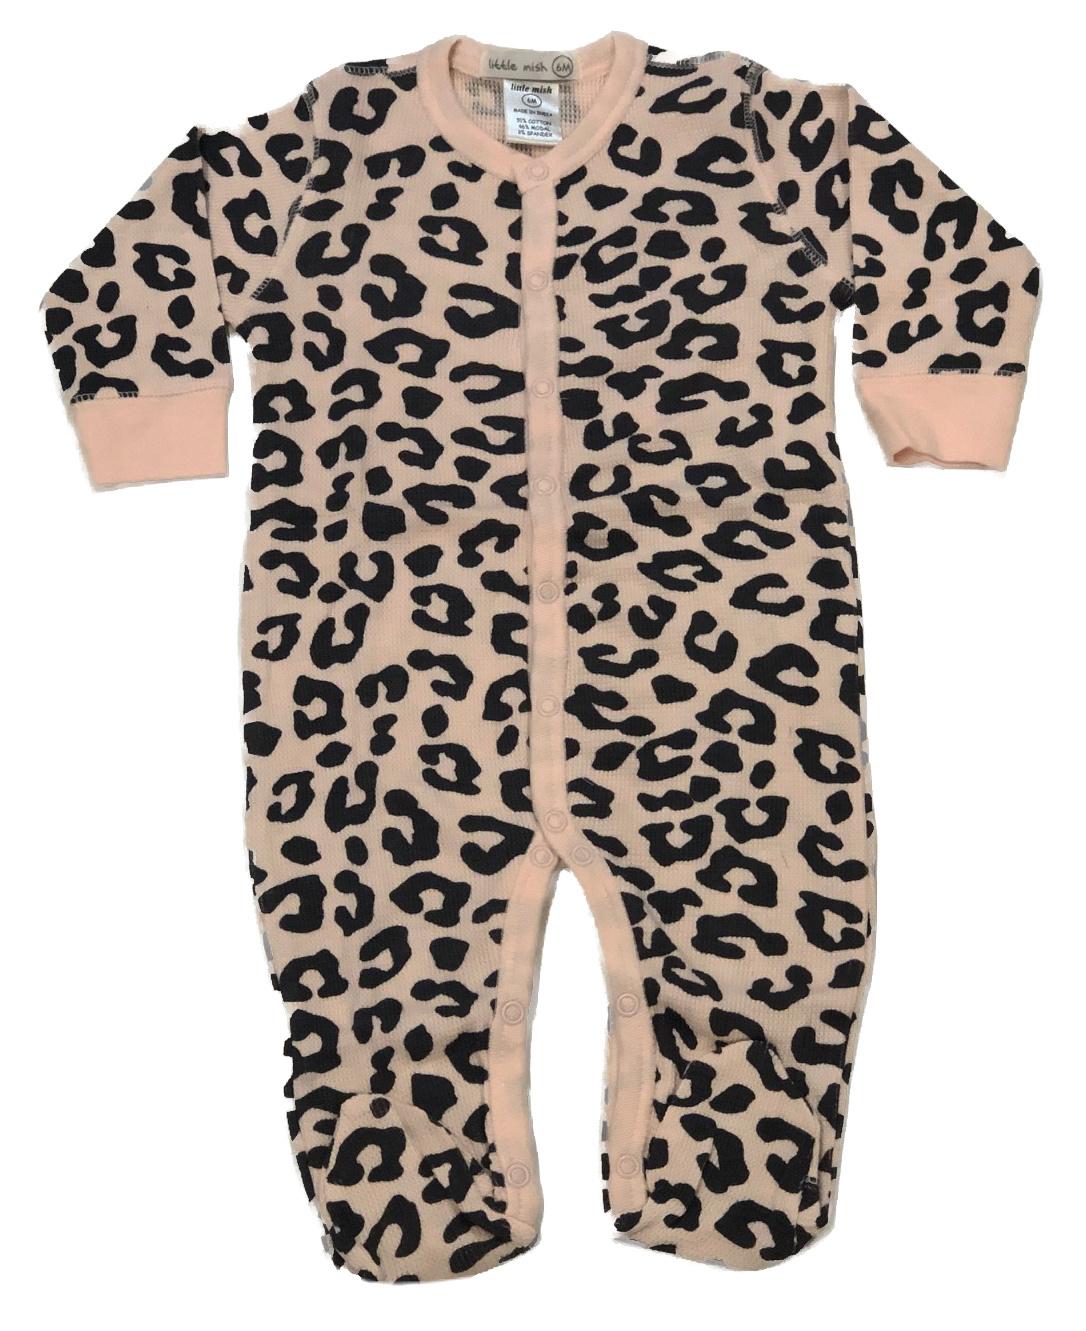 Little Mish Pink Cheetah Thermal Footie